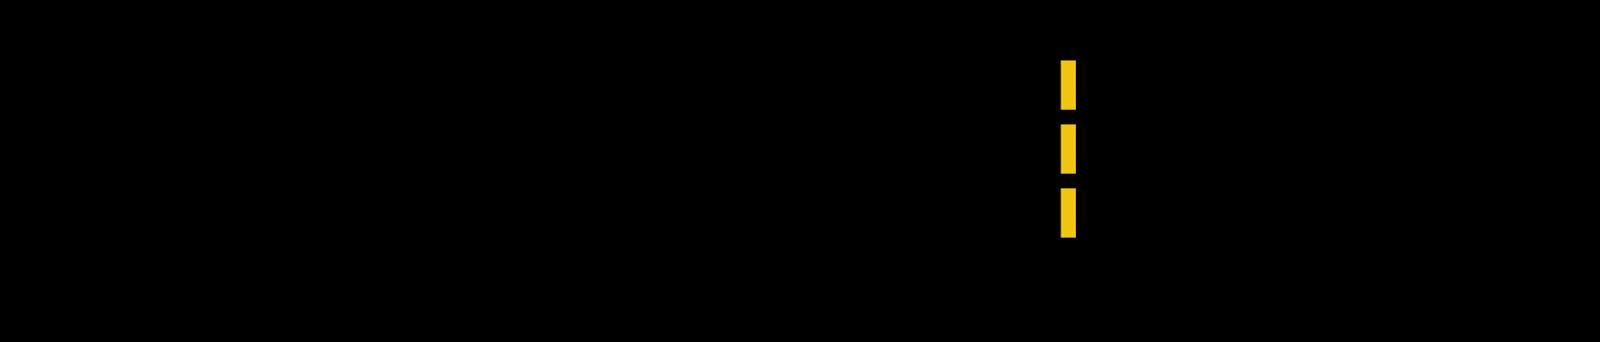 Chaklo logo